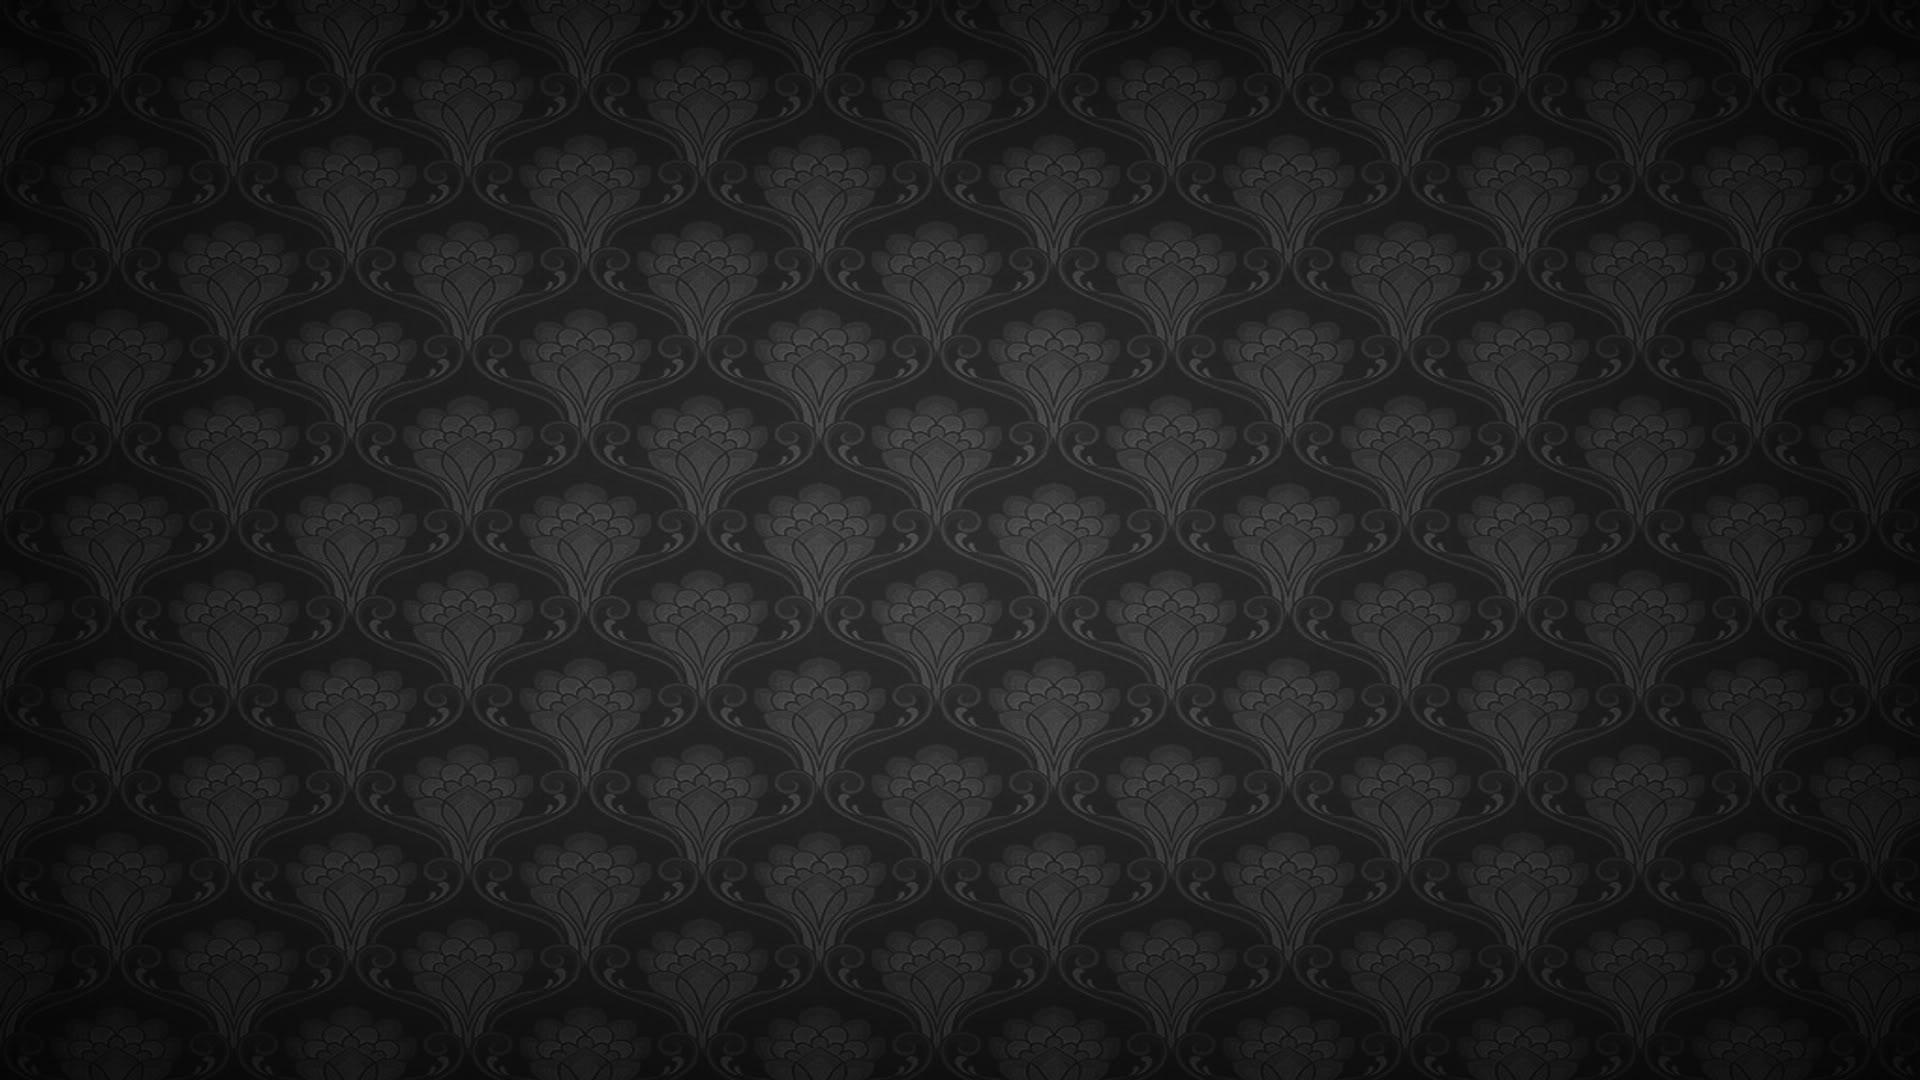 website background wallpaper wallpapersafari